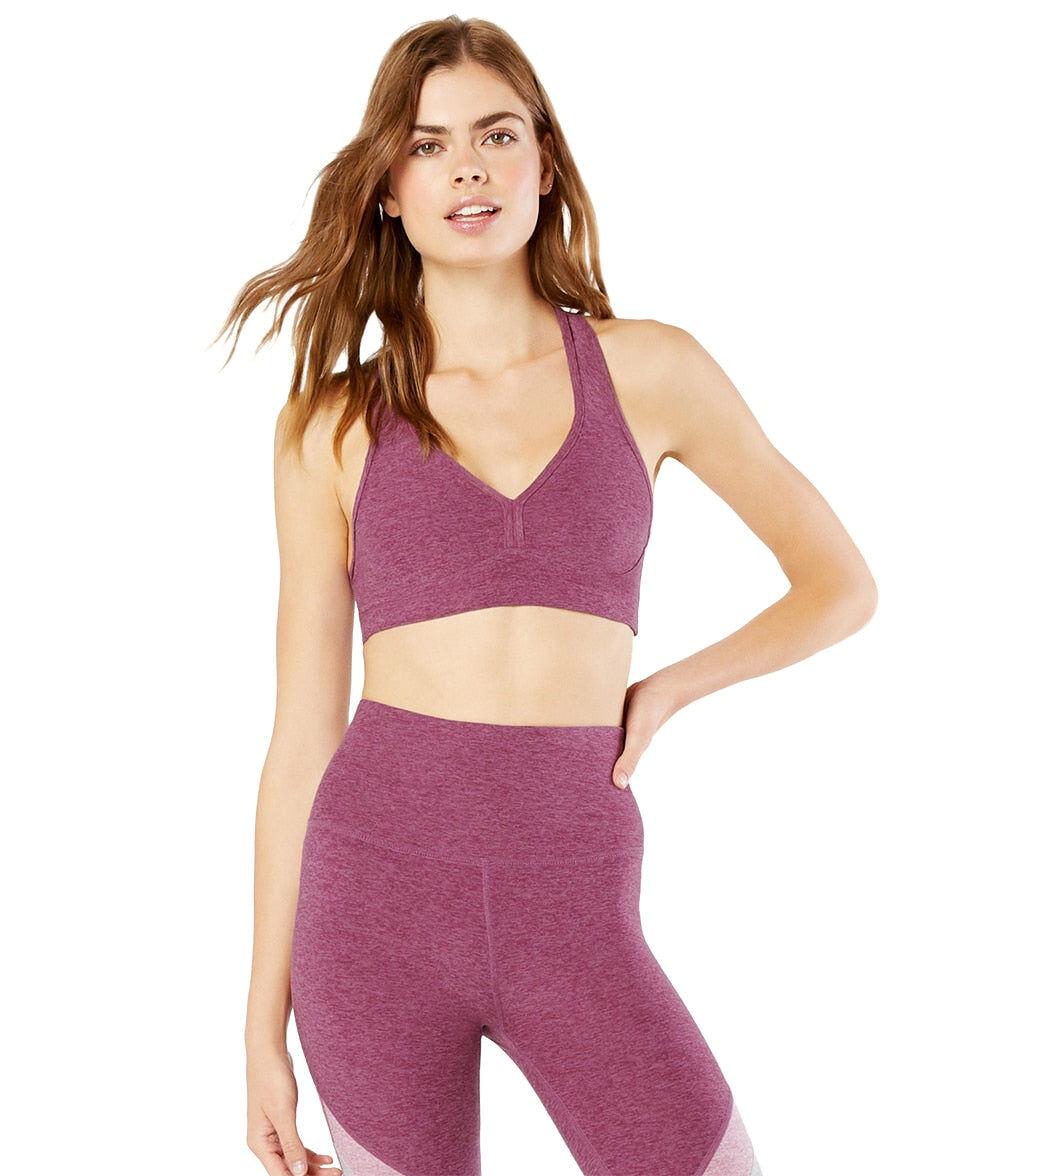 Beyond Yoga Women's Spacedye Lift Your Spirits Sports Bra - Desert Berry-Blush Blooms Berry/Blush Large Spandex Moisture Wicking